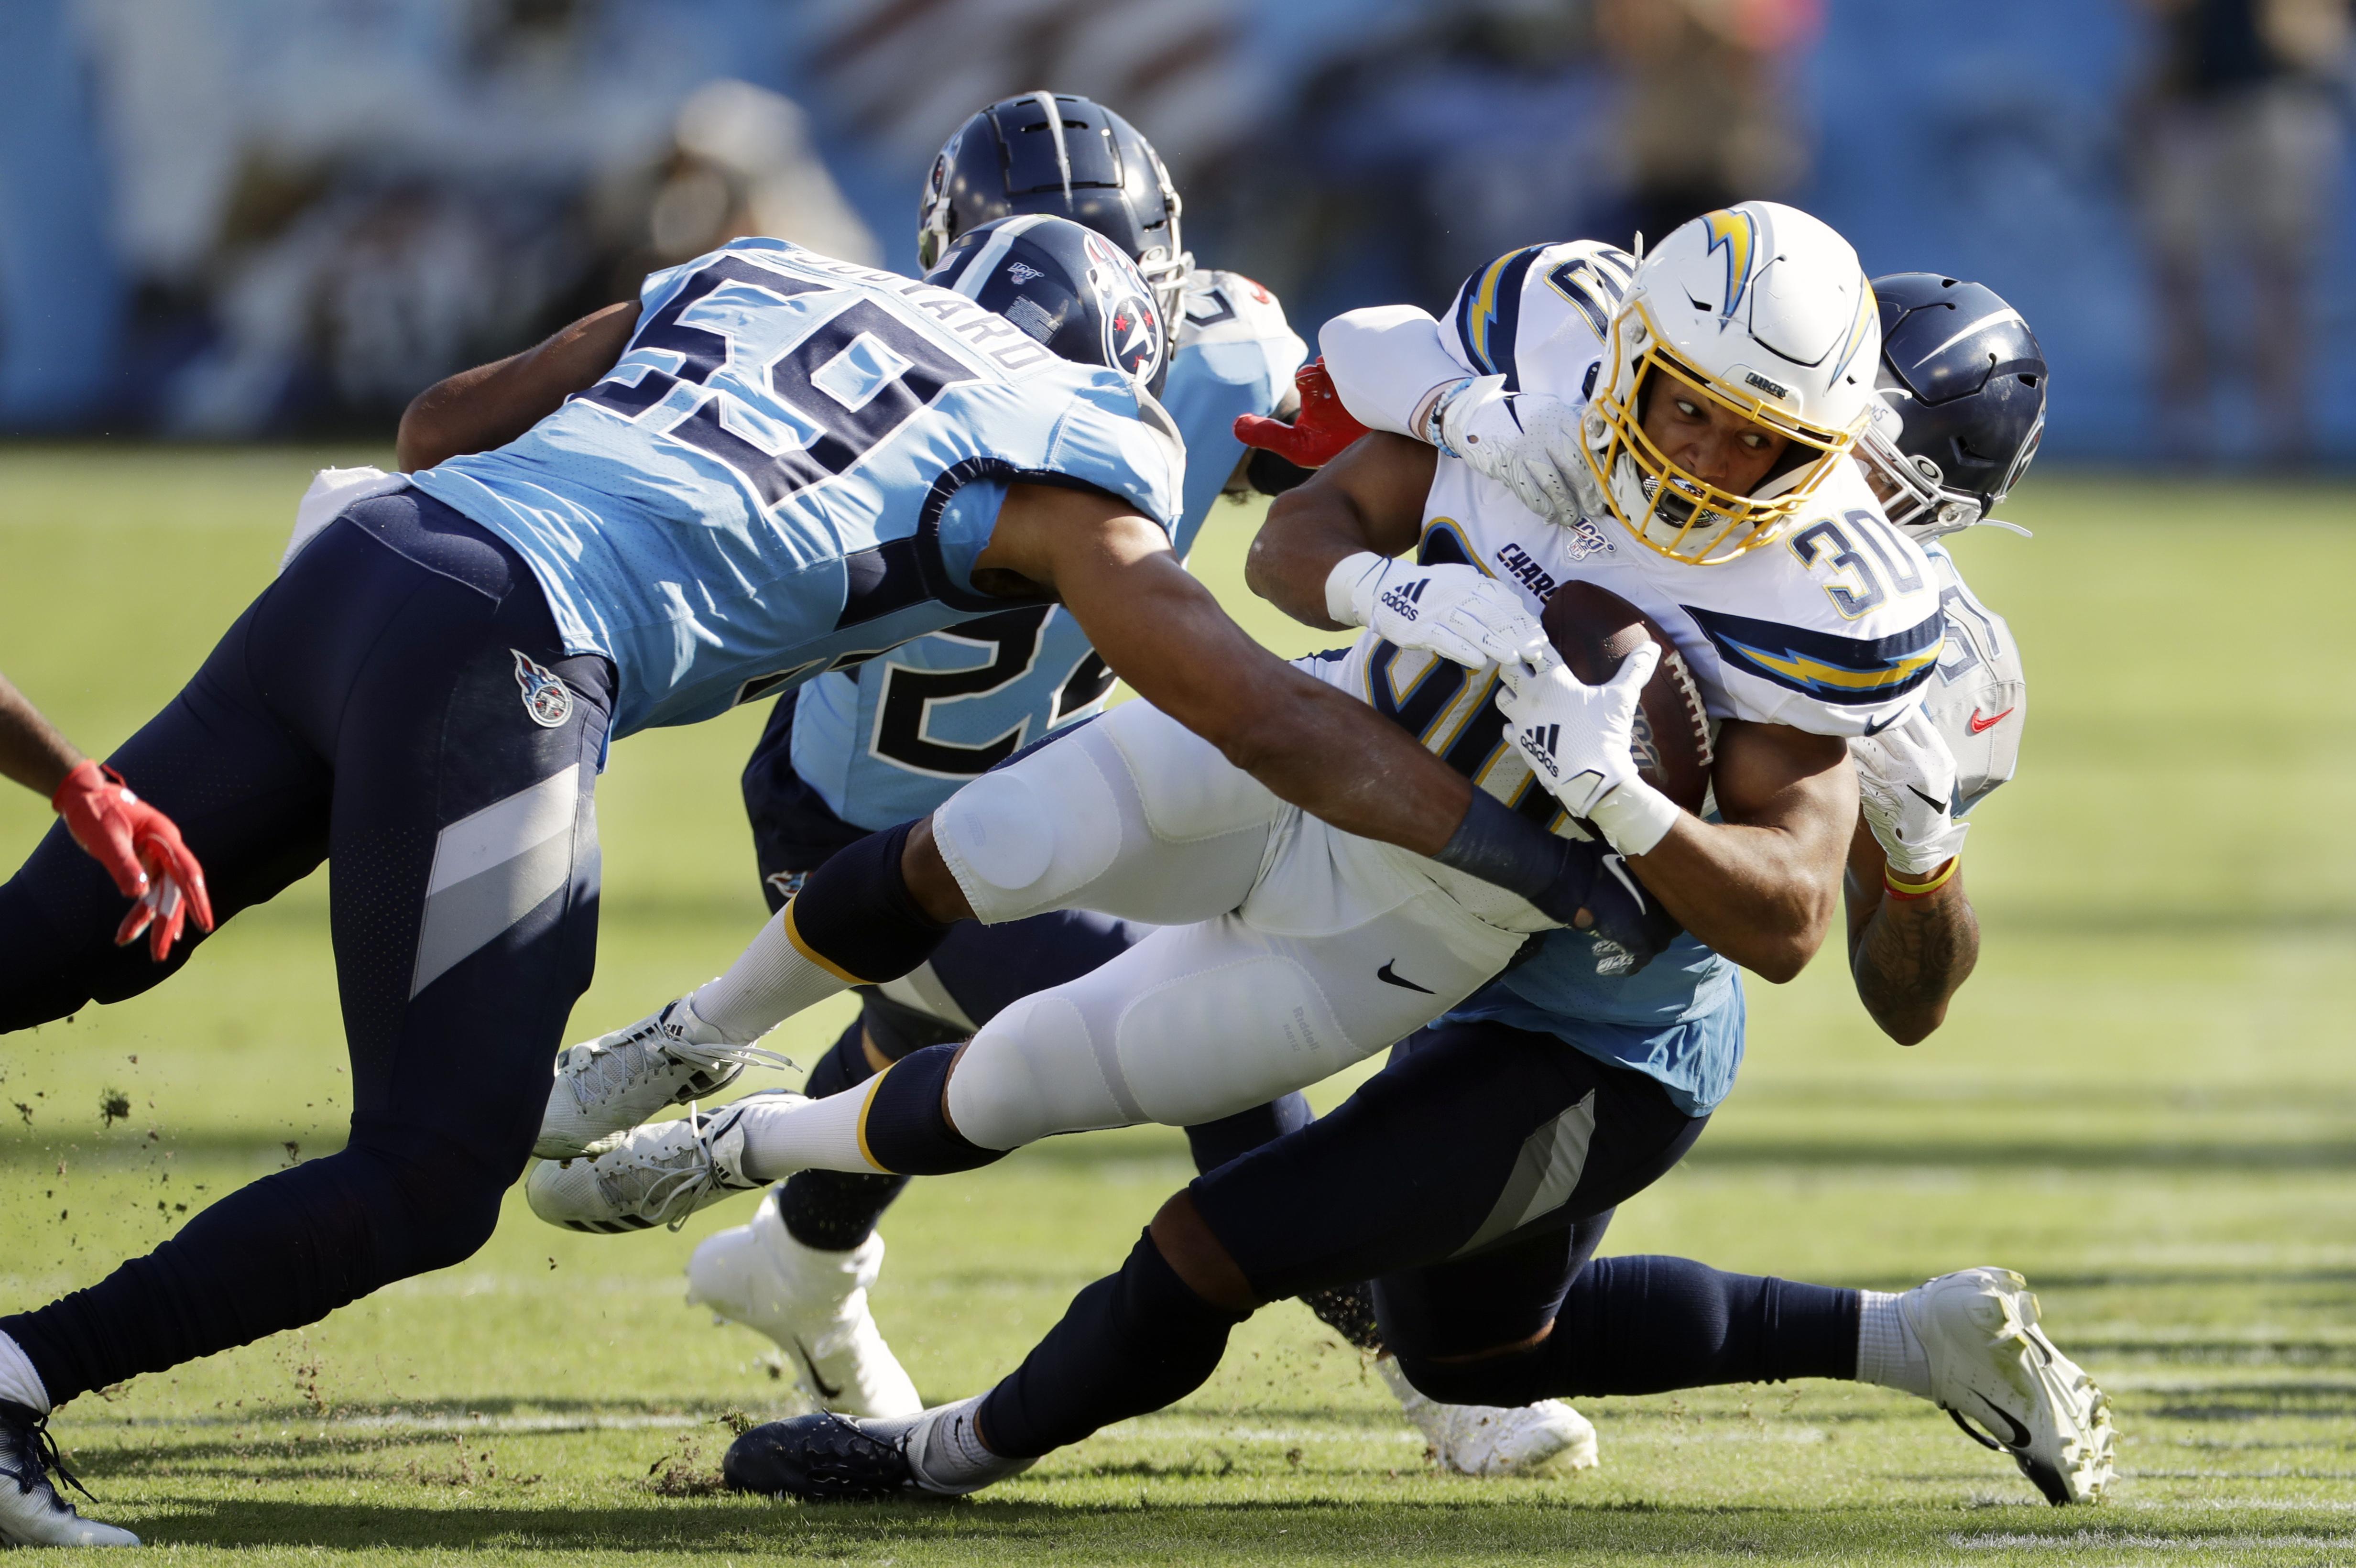 Bolts' versatile Ekeler is bright spot for dismal offense